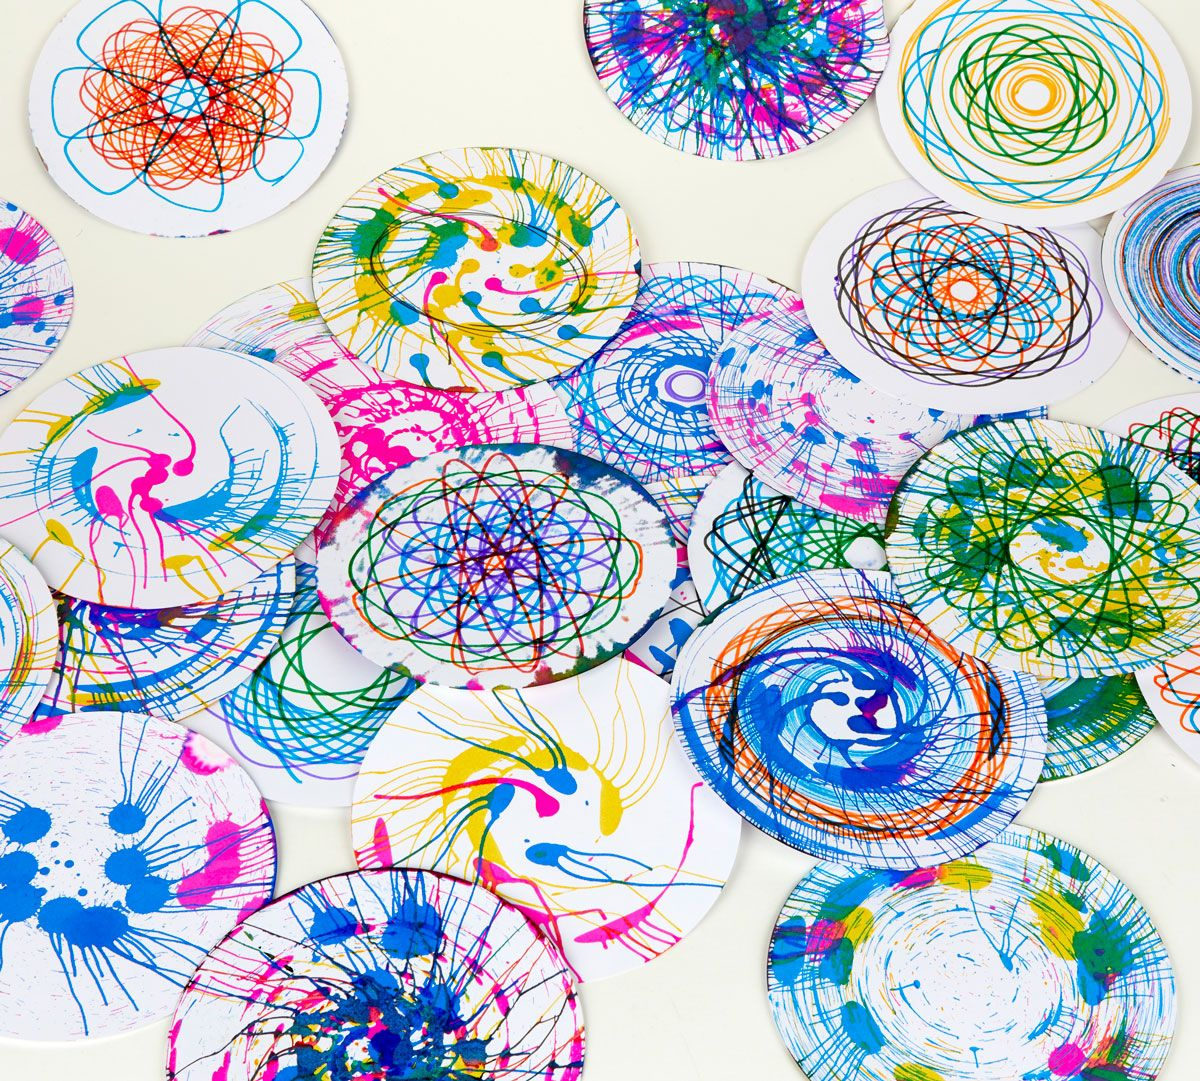 Spin Spiral Refill Set 50 Paper Discs Crayola Com Crayola In 2020 Spiral Art Art Kit Crayola Crafts